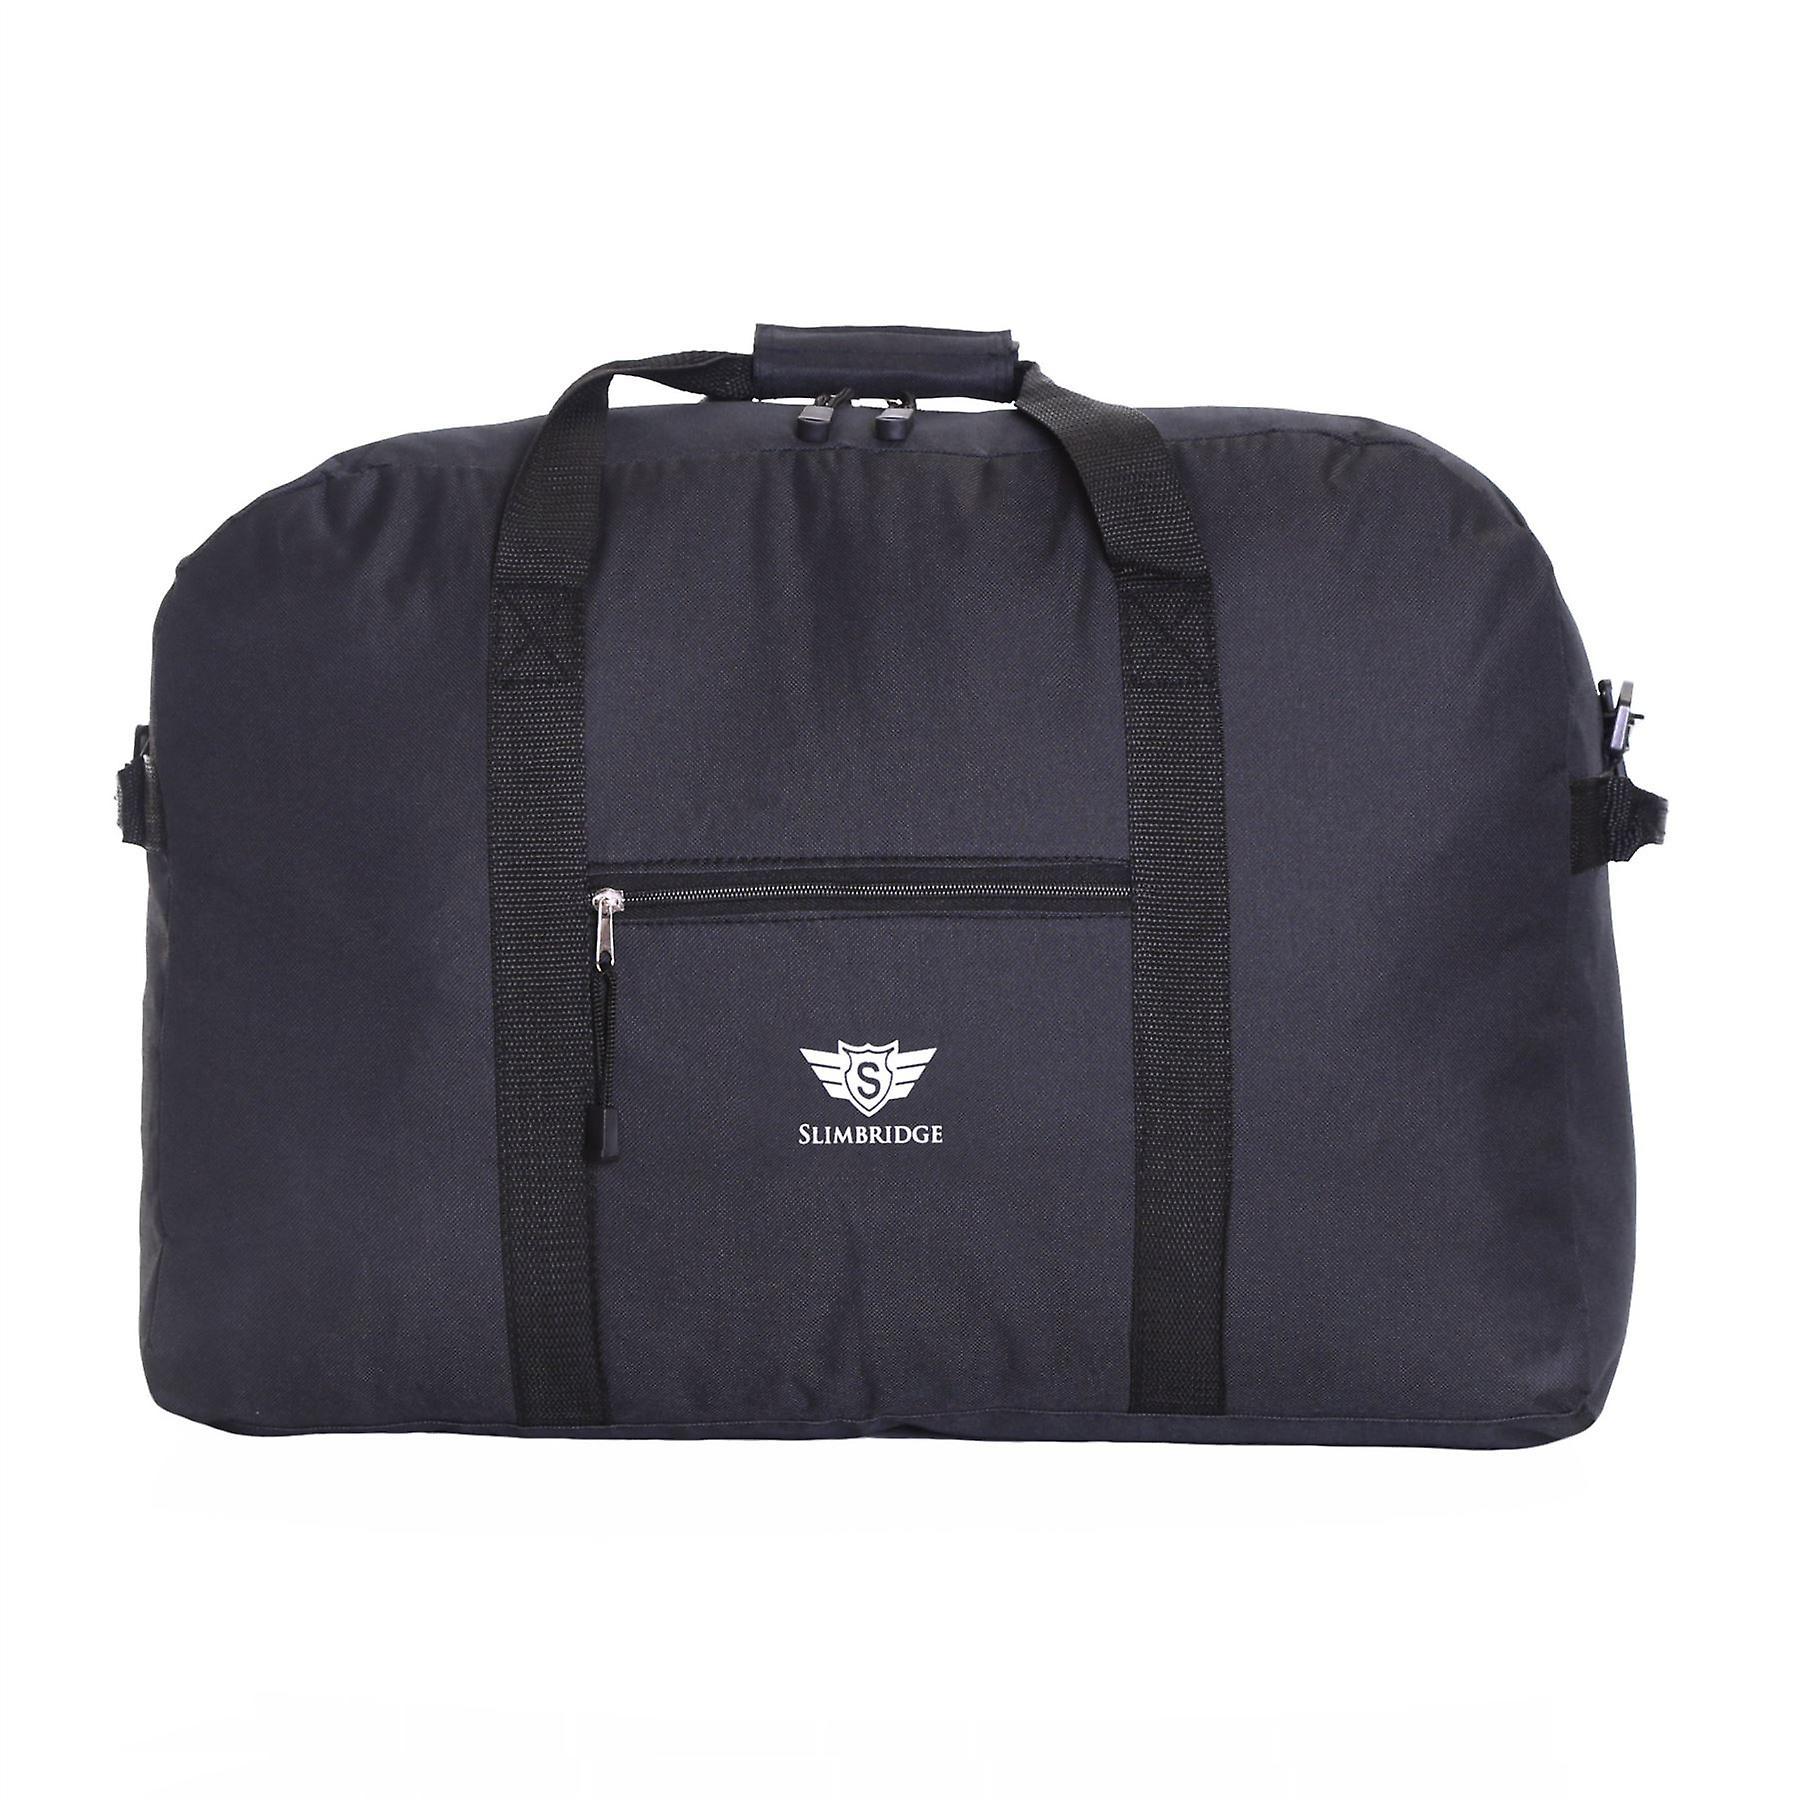 Slimbridge Tarbet 55 cm Cabin Approved Bag, Black